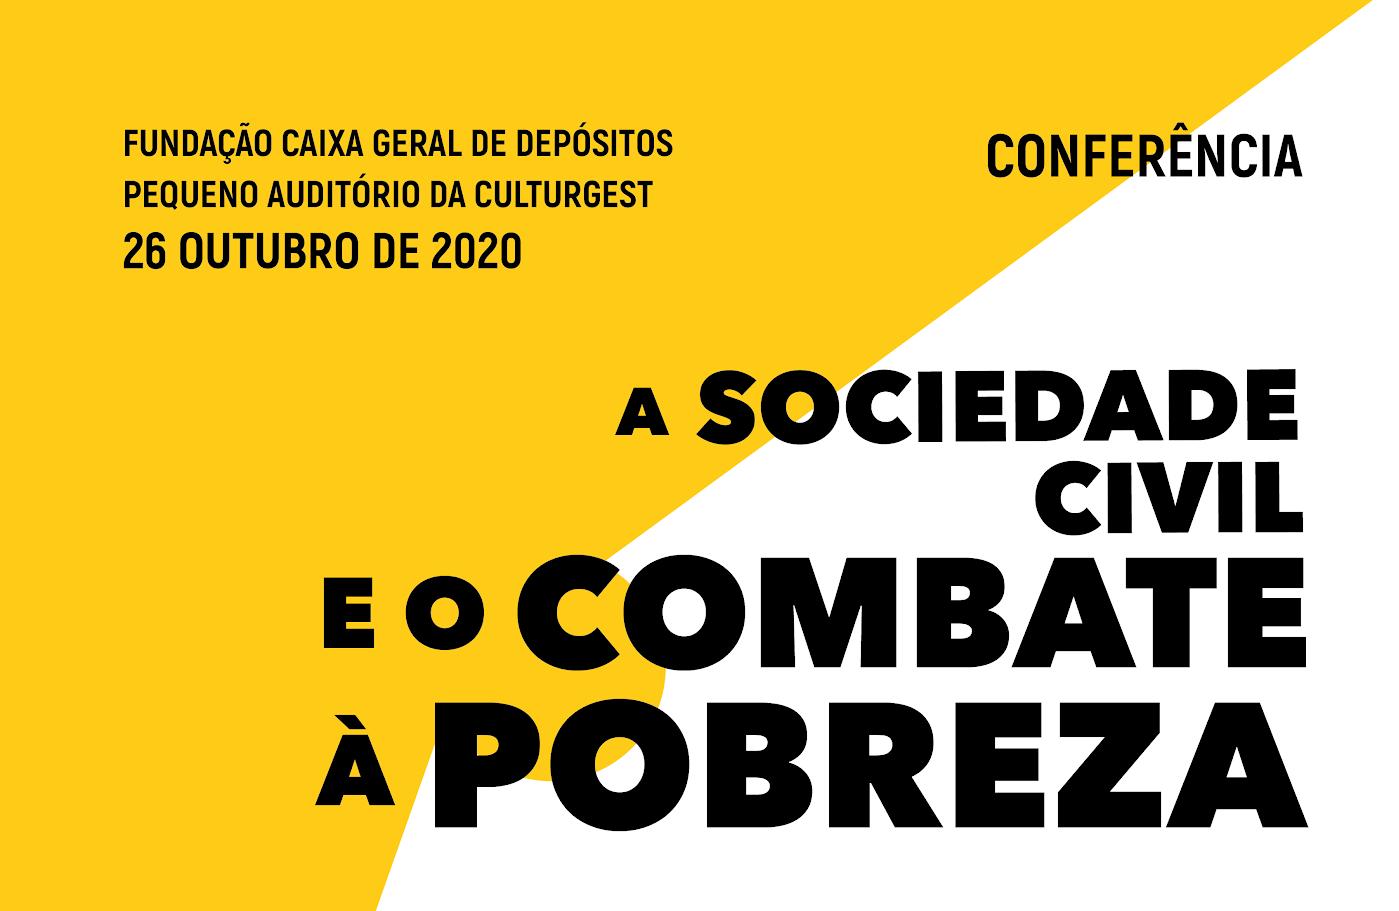 Conferência A Sociedade Civil e o Combate à Pobreza